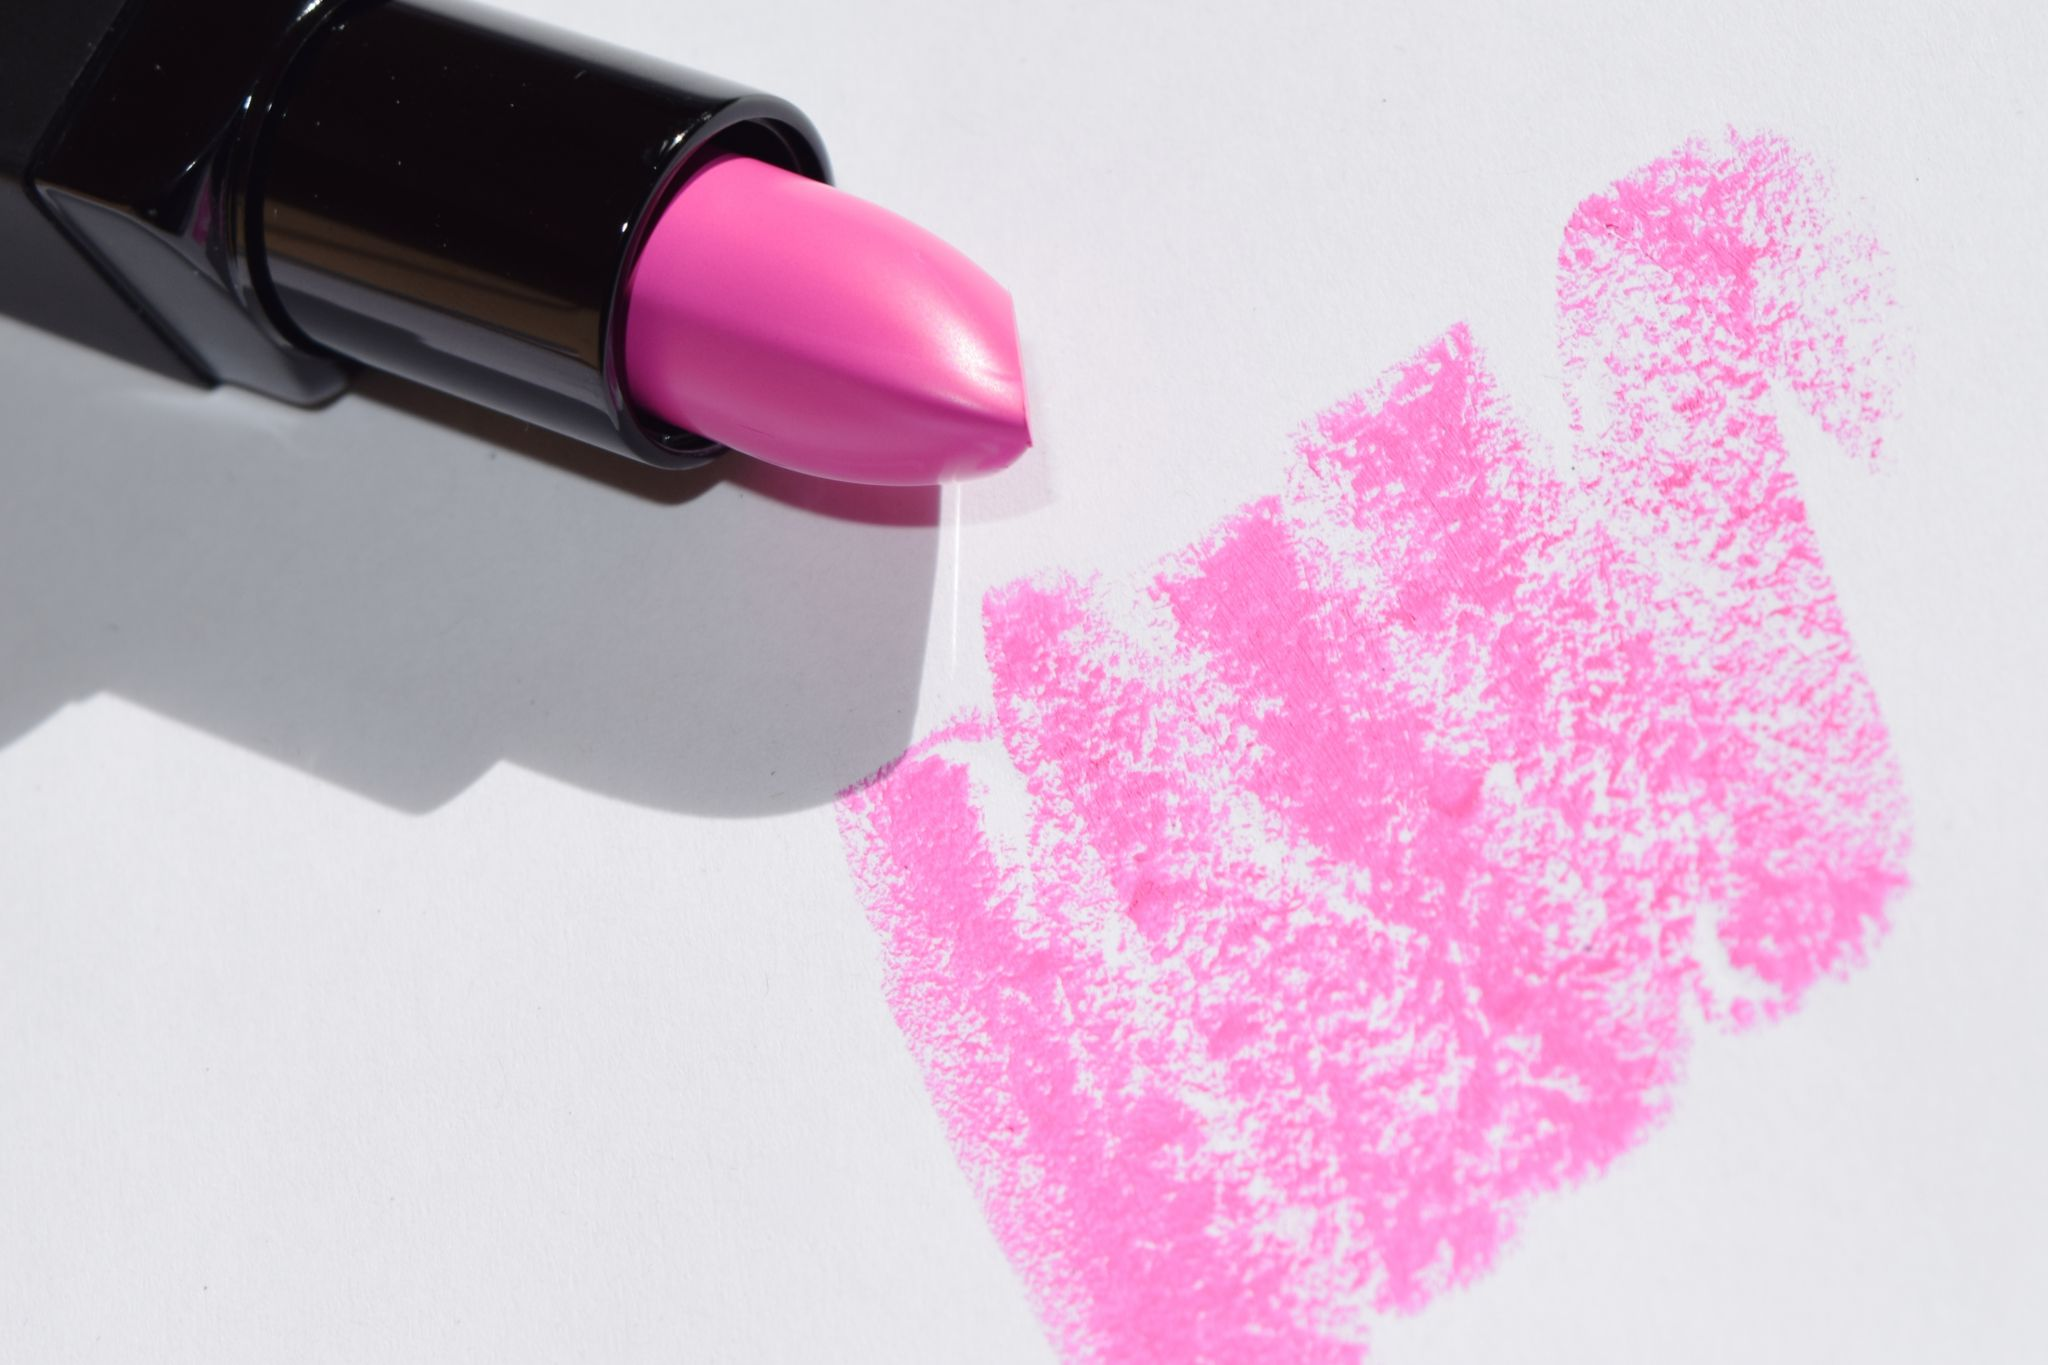 Smashbox Be Legendary Lipstick Matte Vibrant Magenta The Luxe List Palettelimited Edition Swatch